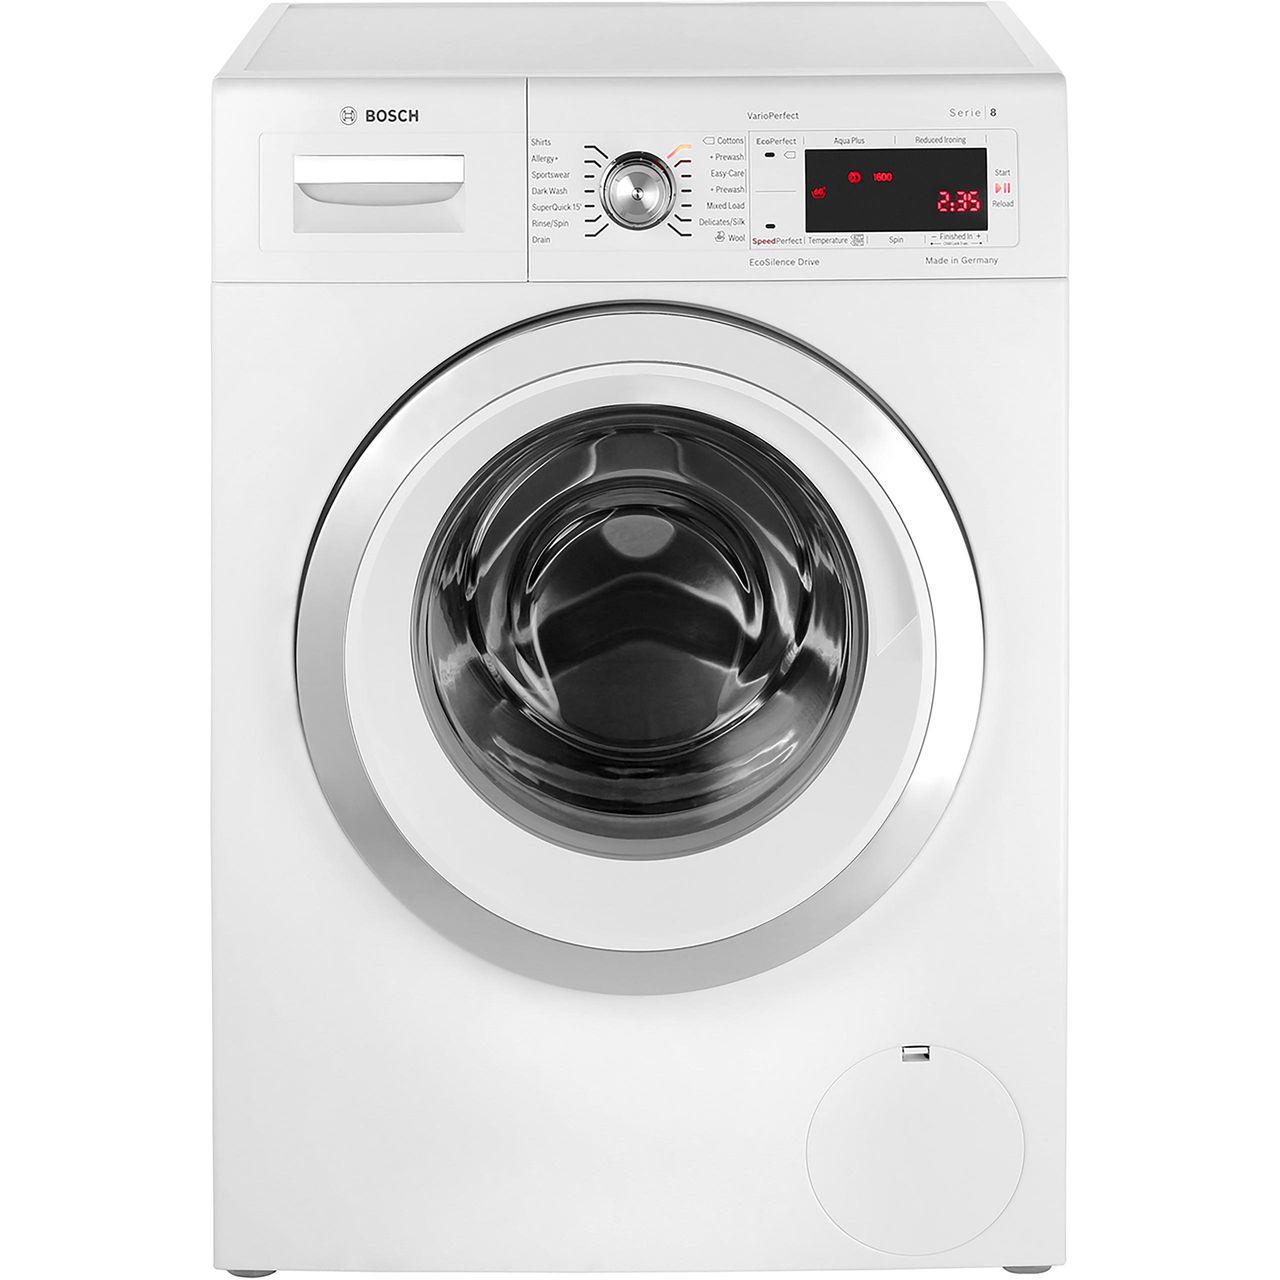 Bosch Waw32450gb Serie 8 A Rated 9kg 1600 Rpm Washing Machine